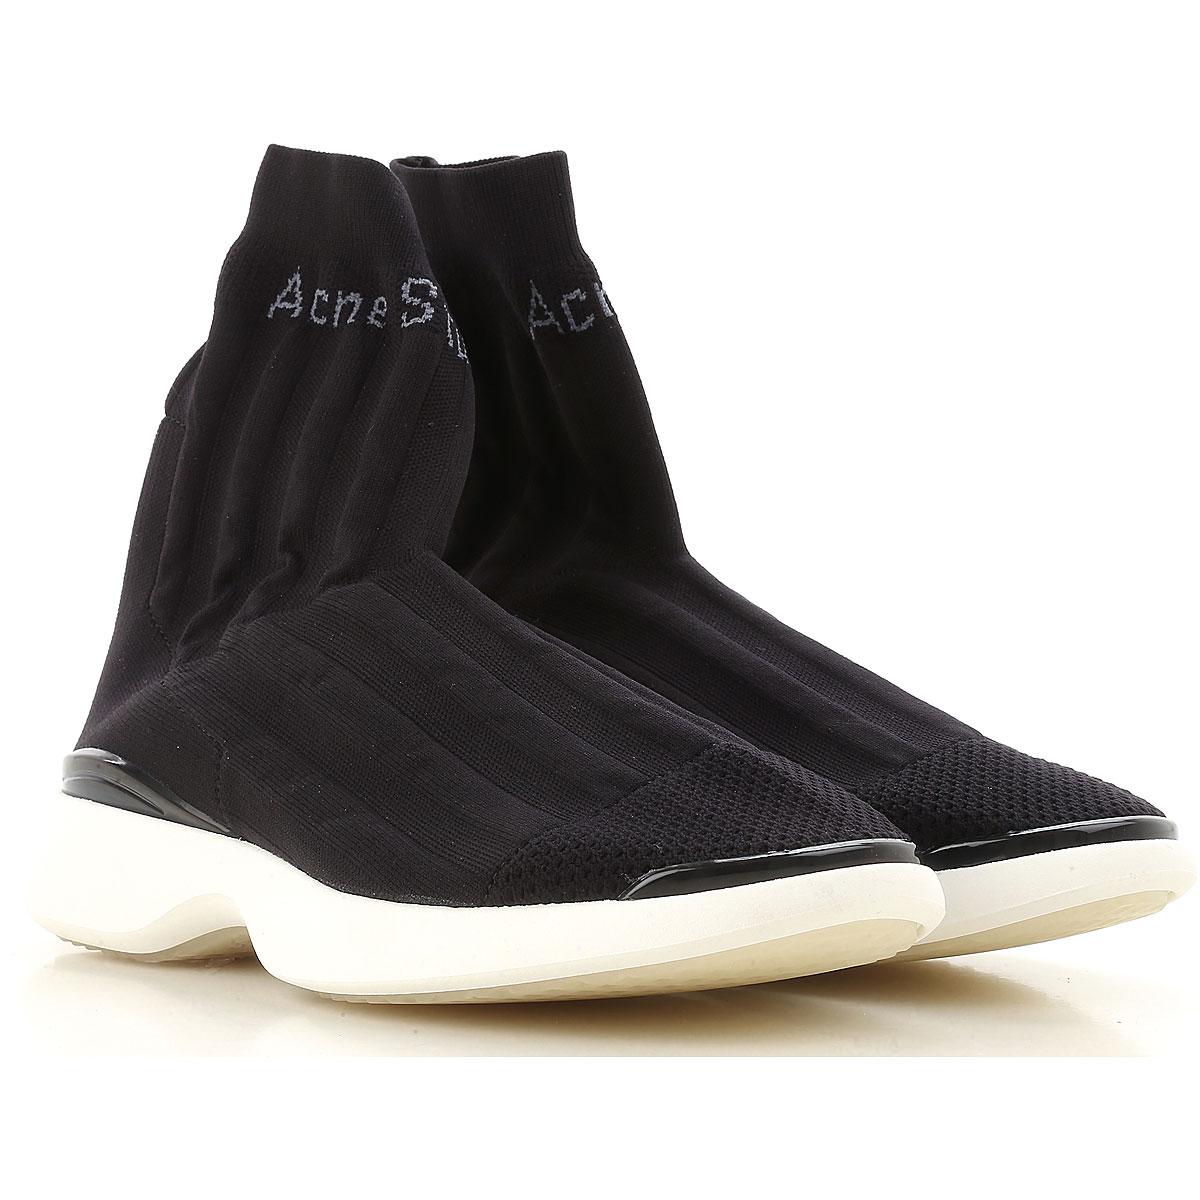 eca76cc55809 Nouveau Acne Studios Sneaker Femme, Noir, Tissu Stretch, 2017, 39 40